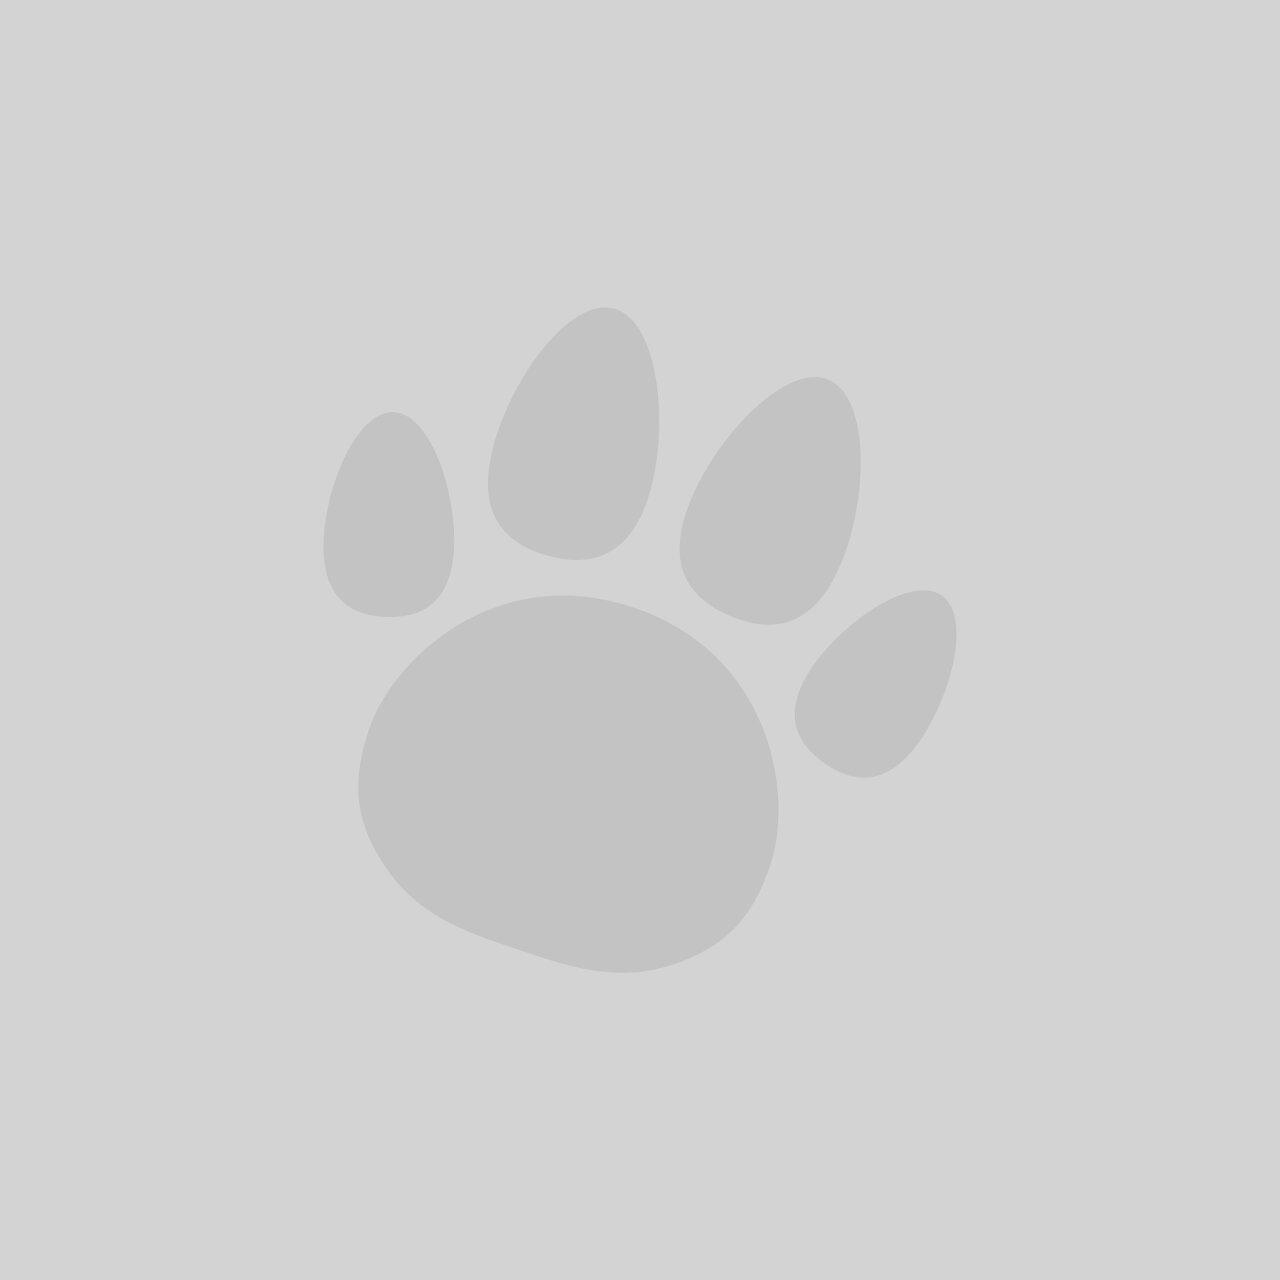 Ancol Nylon Softweave Dog Lead 1mx19mm (3 Colour Options)